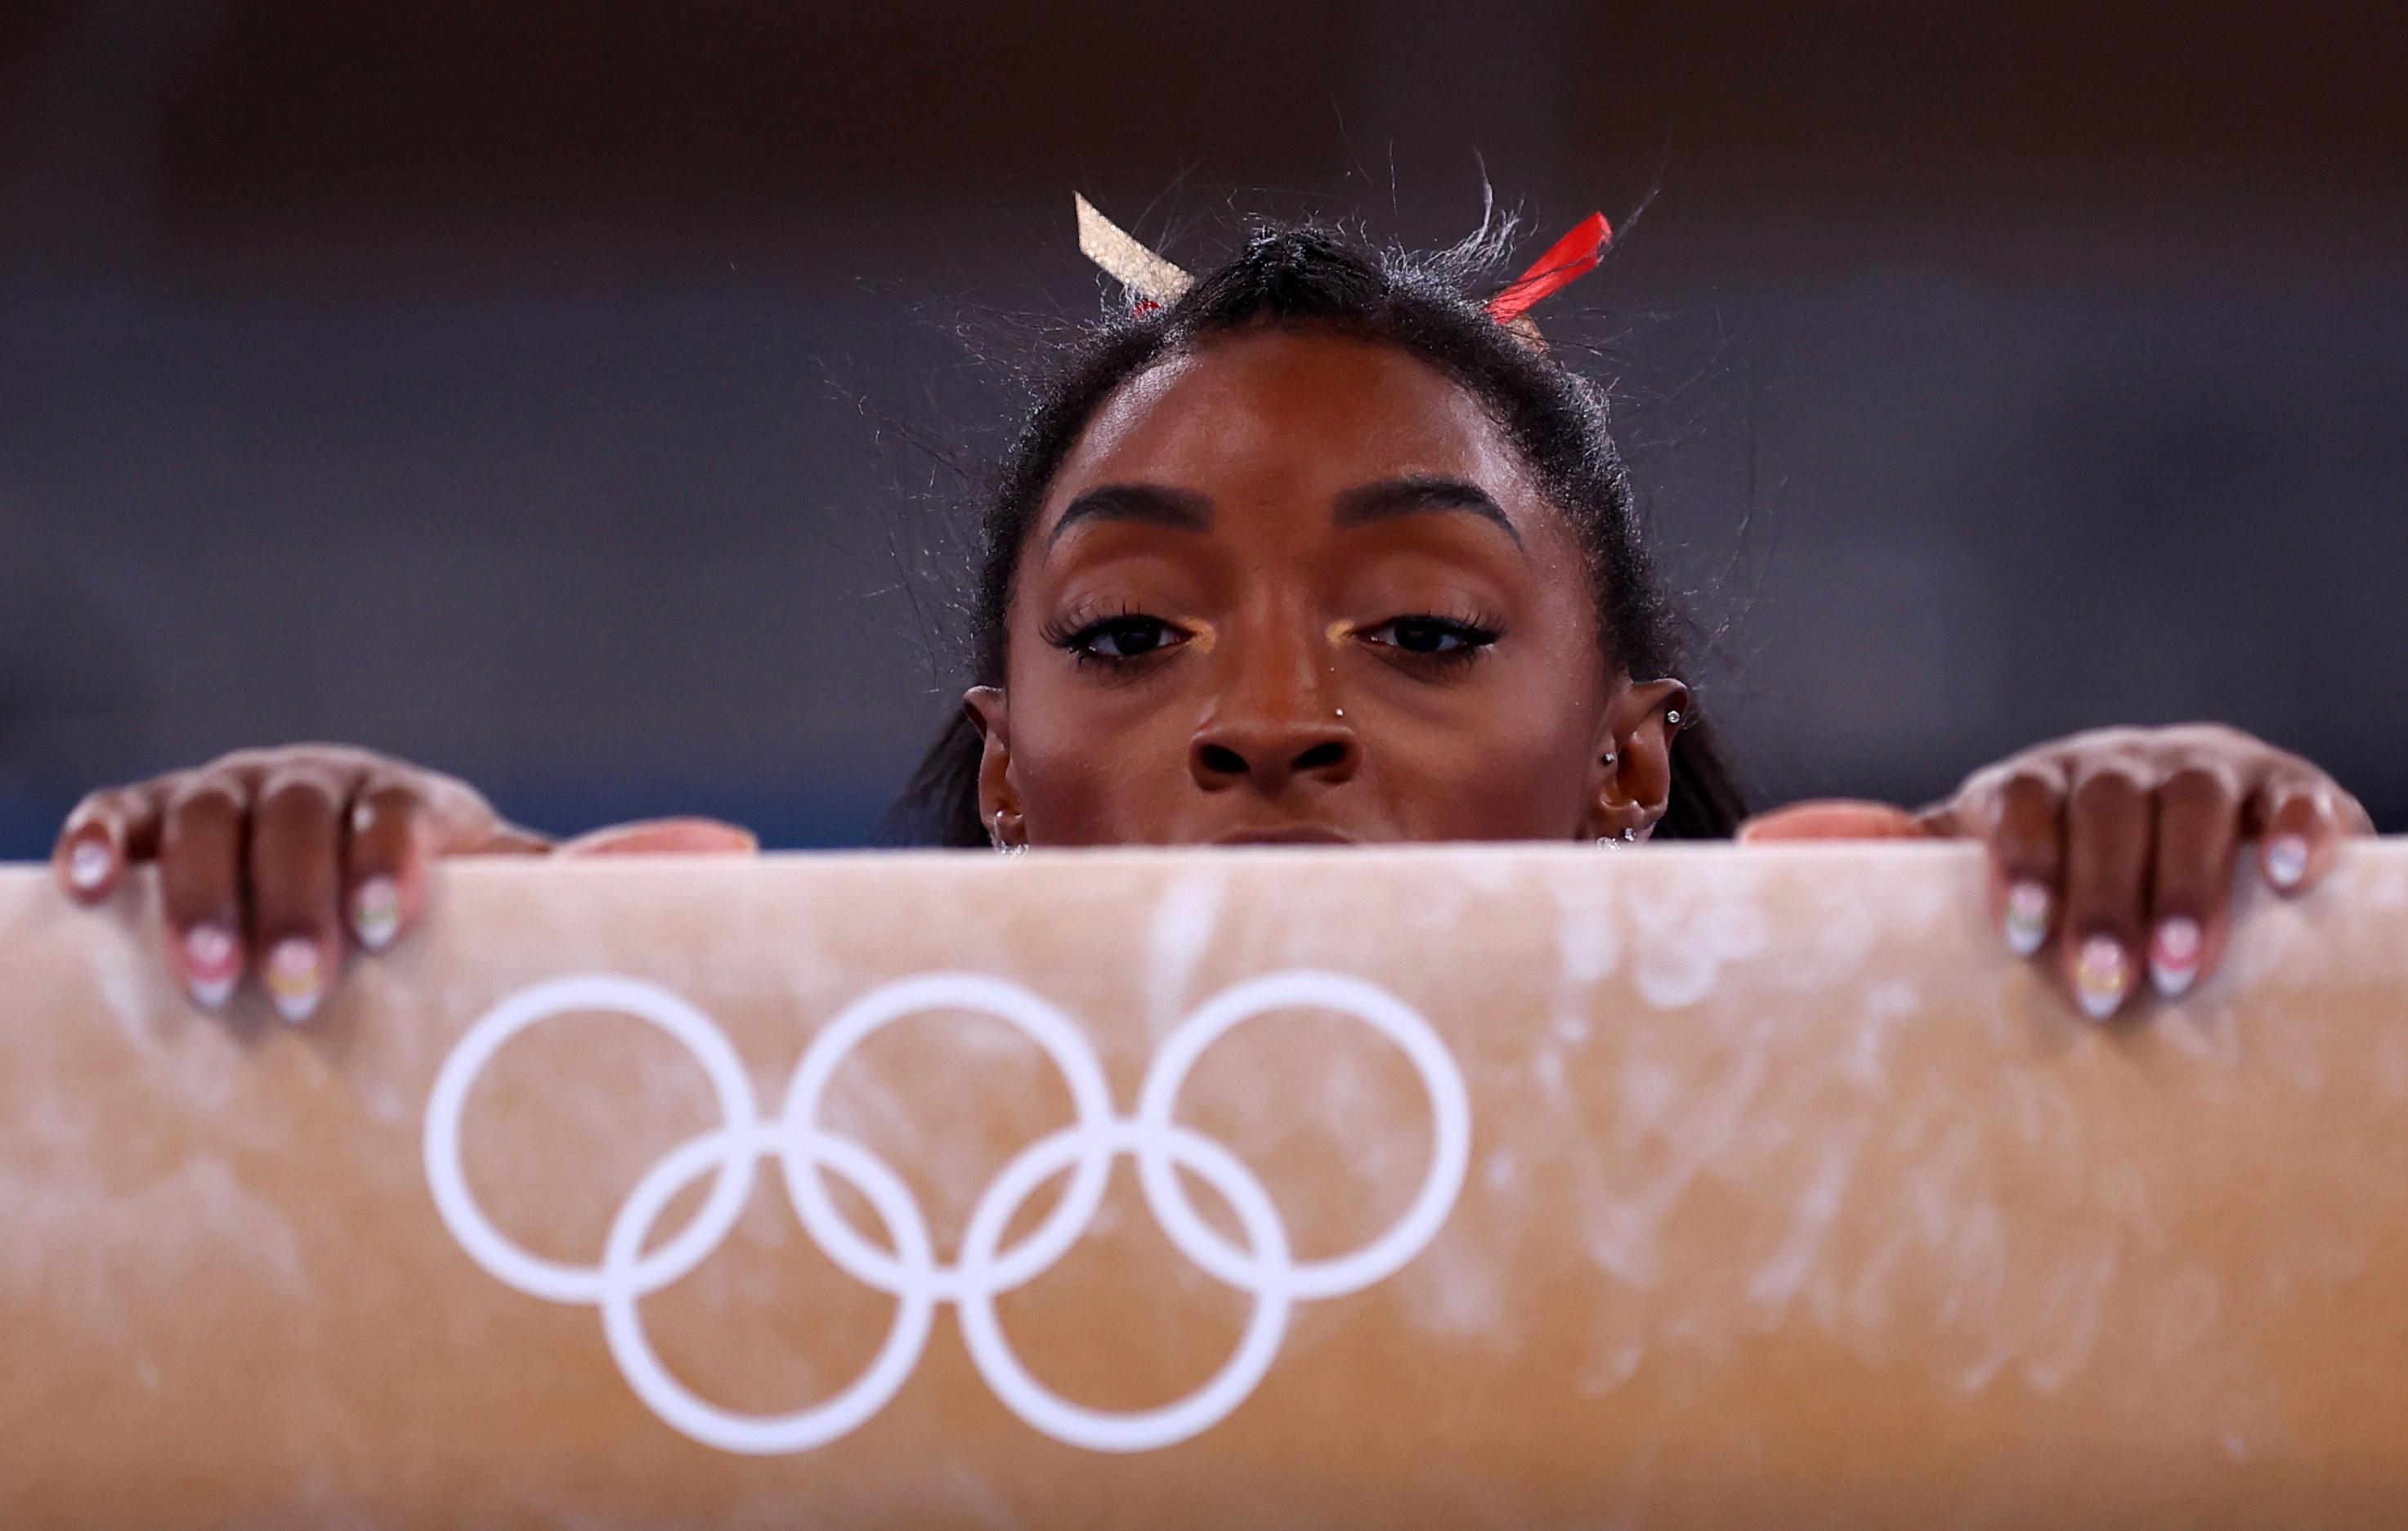 Tokyo 2020 Olympics - Gymnastics - Artistic - Women's Beam - Qualification - Ariake Gymnastics Centre, Tokyo, Japan - July 25, 2021. Simone Biles of the United States competes on the balance beam REUTERS/Mike Blake